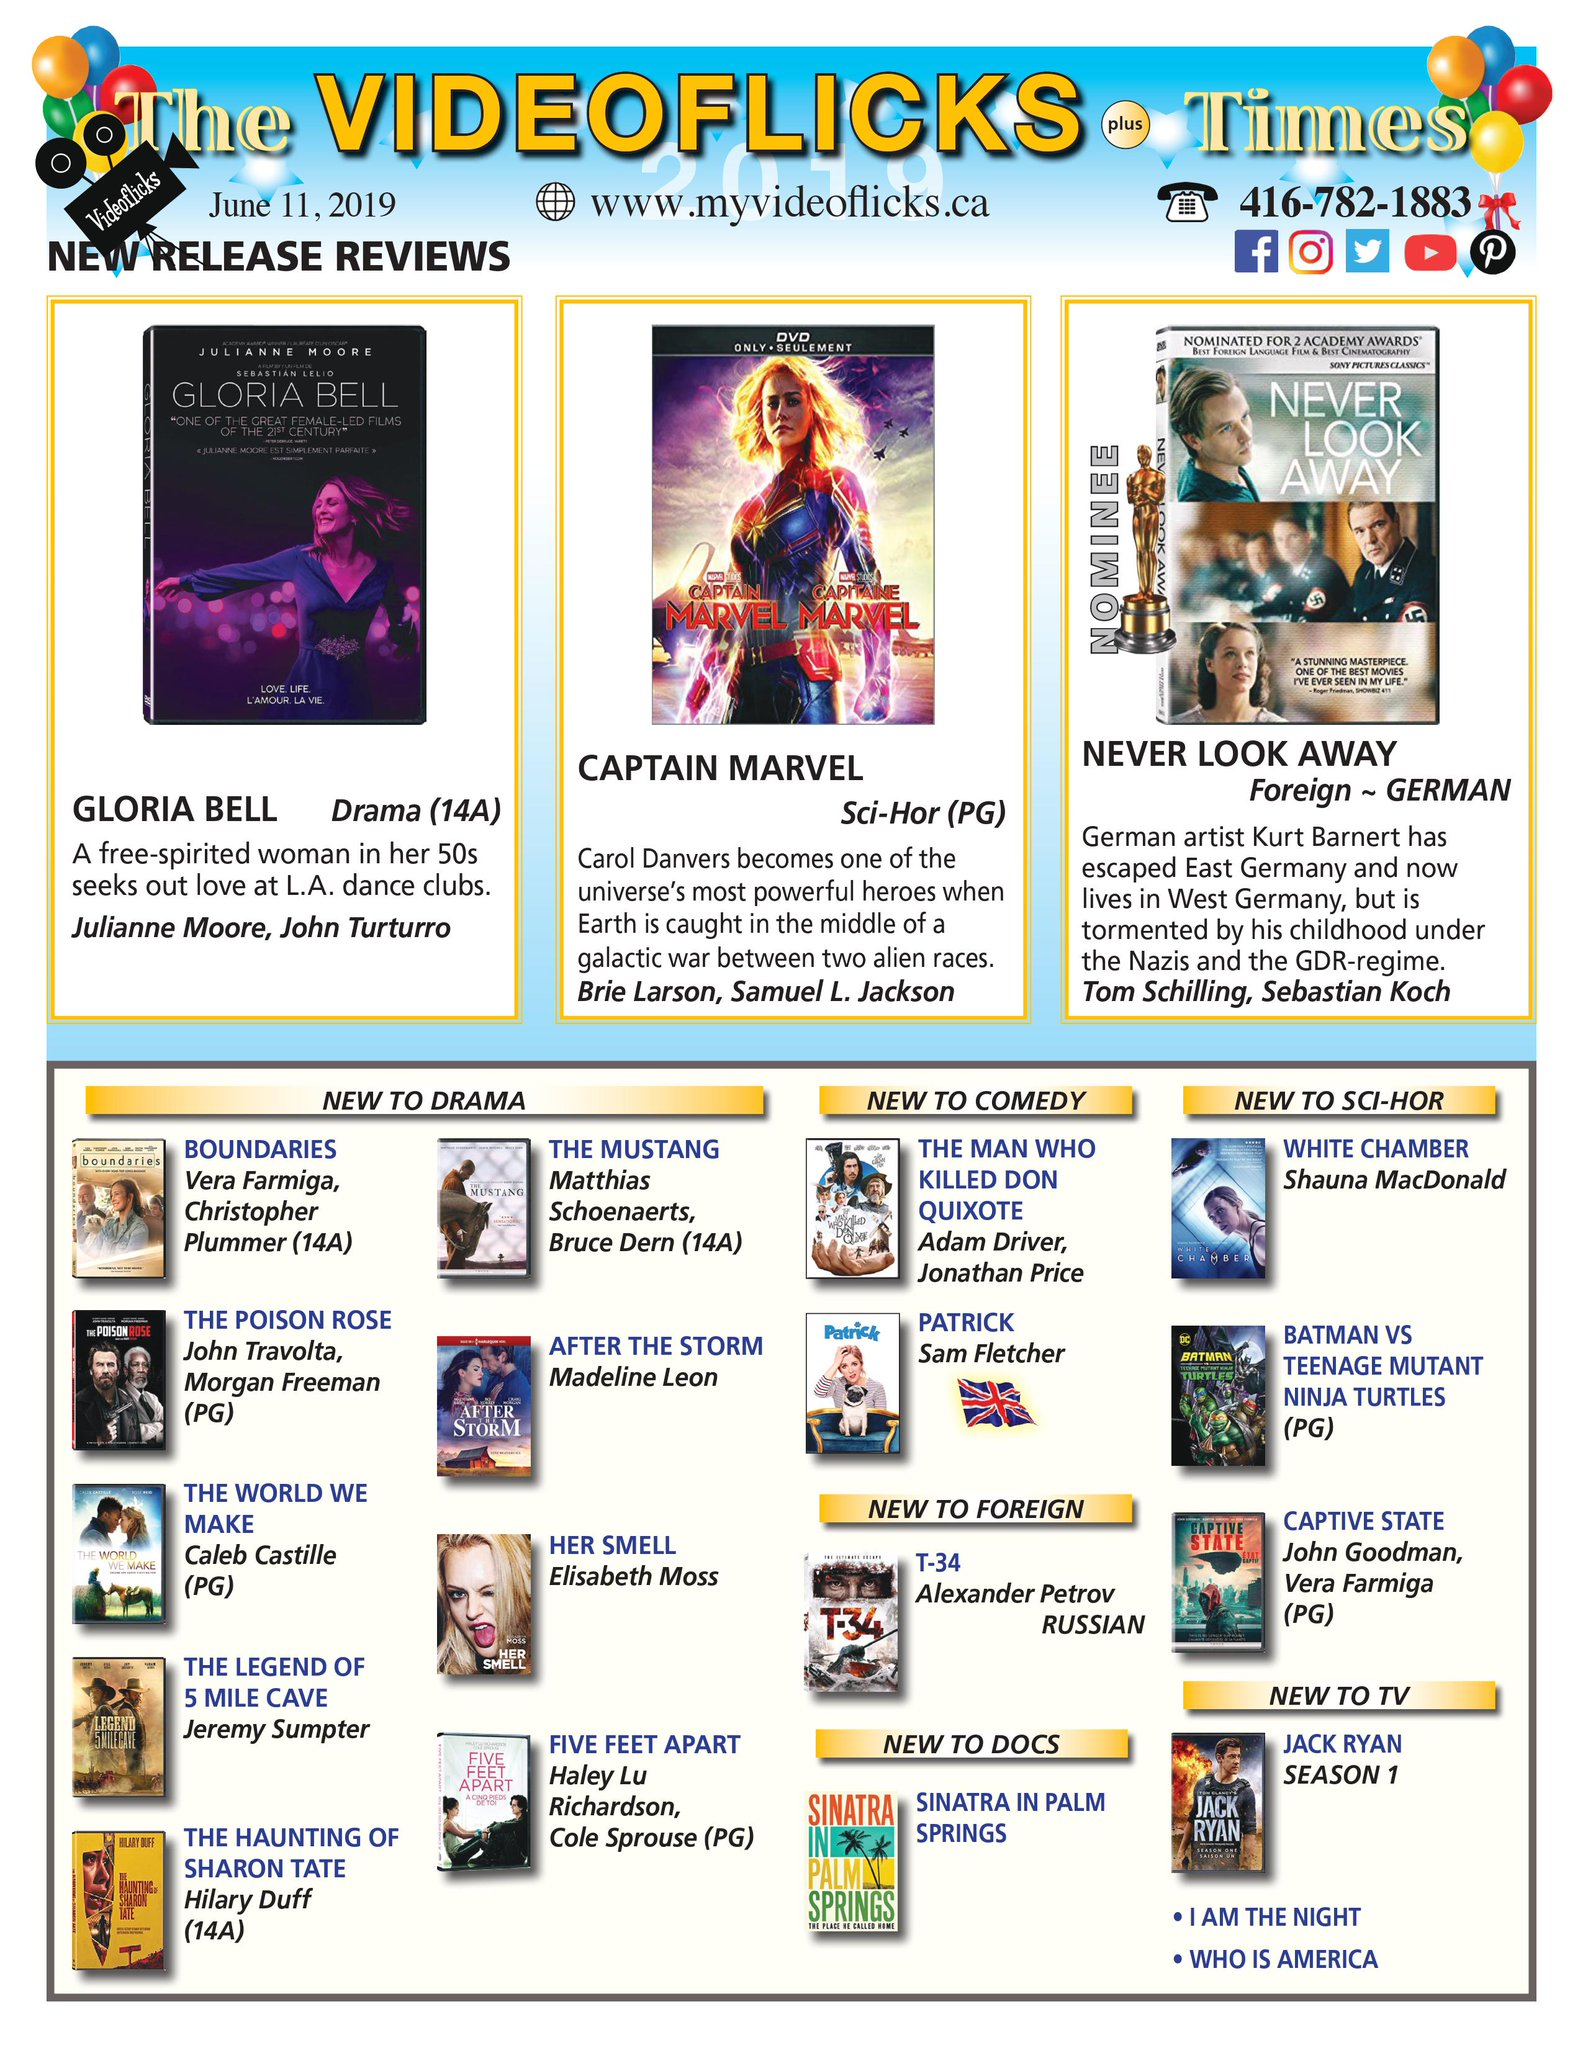 june 11 2019 newsletter dvd bluray rentals toronto